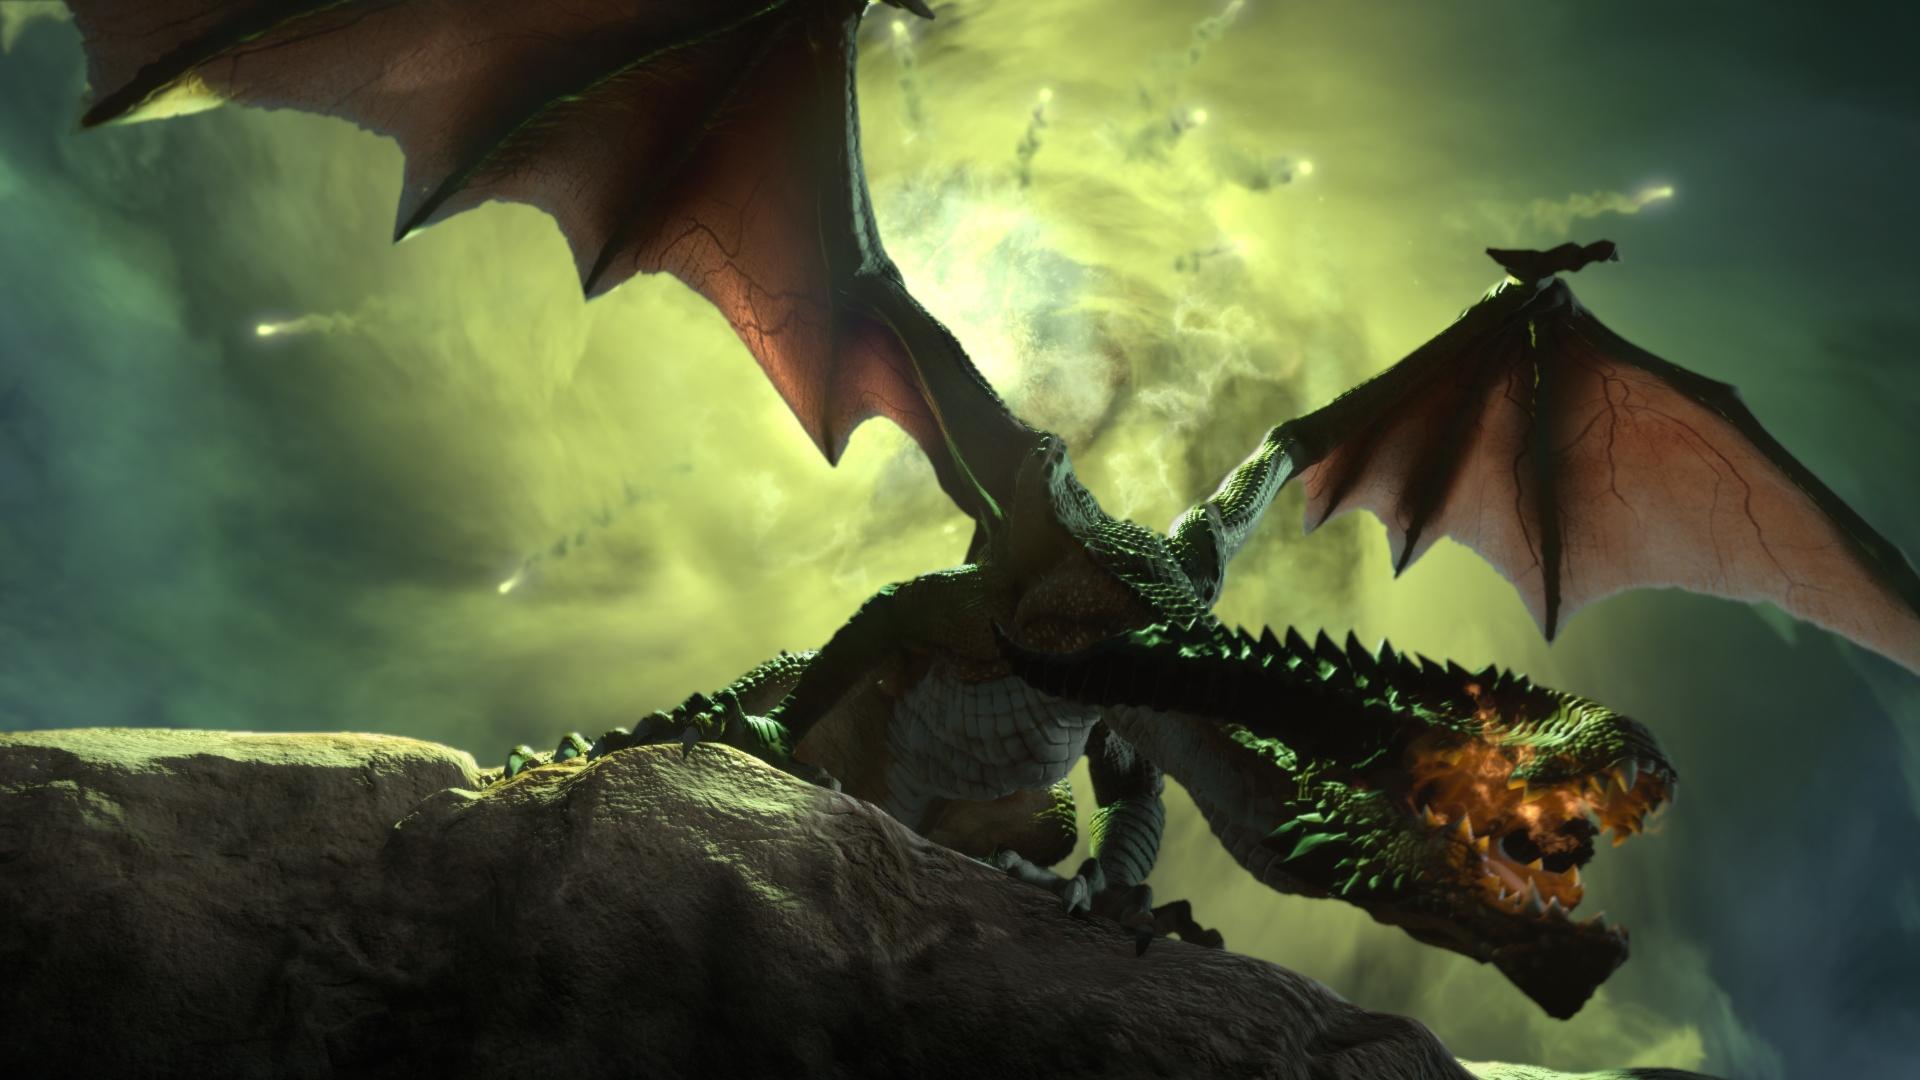 Dragon Age Inquisition hd wallpaper for pc